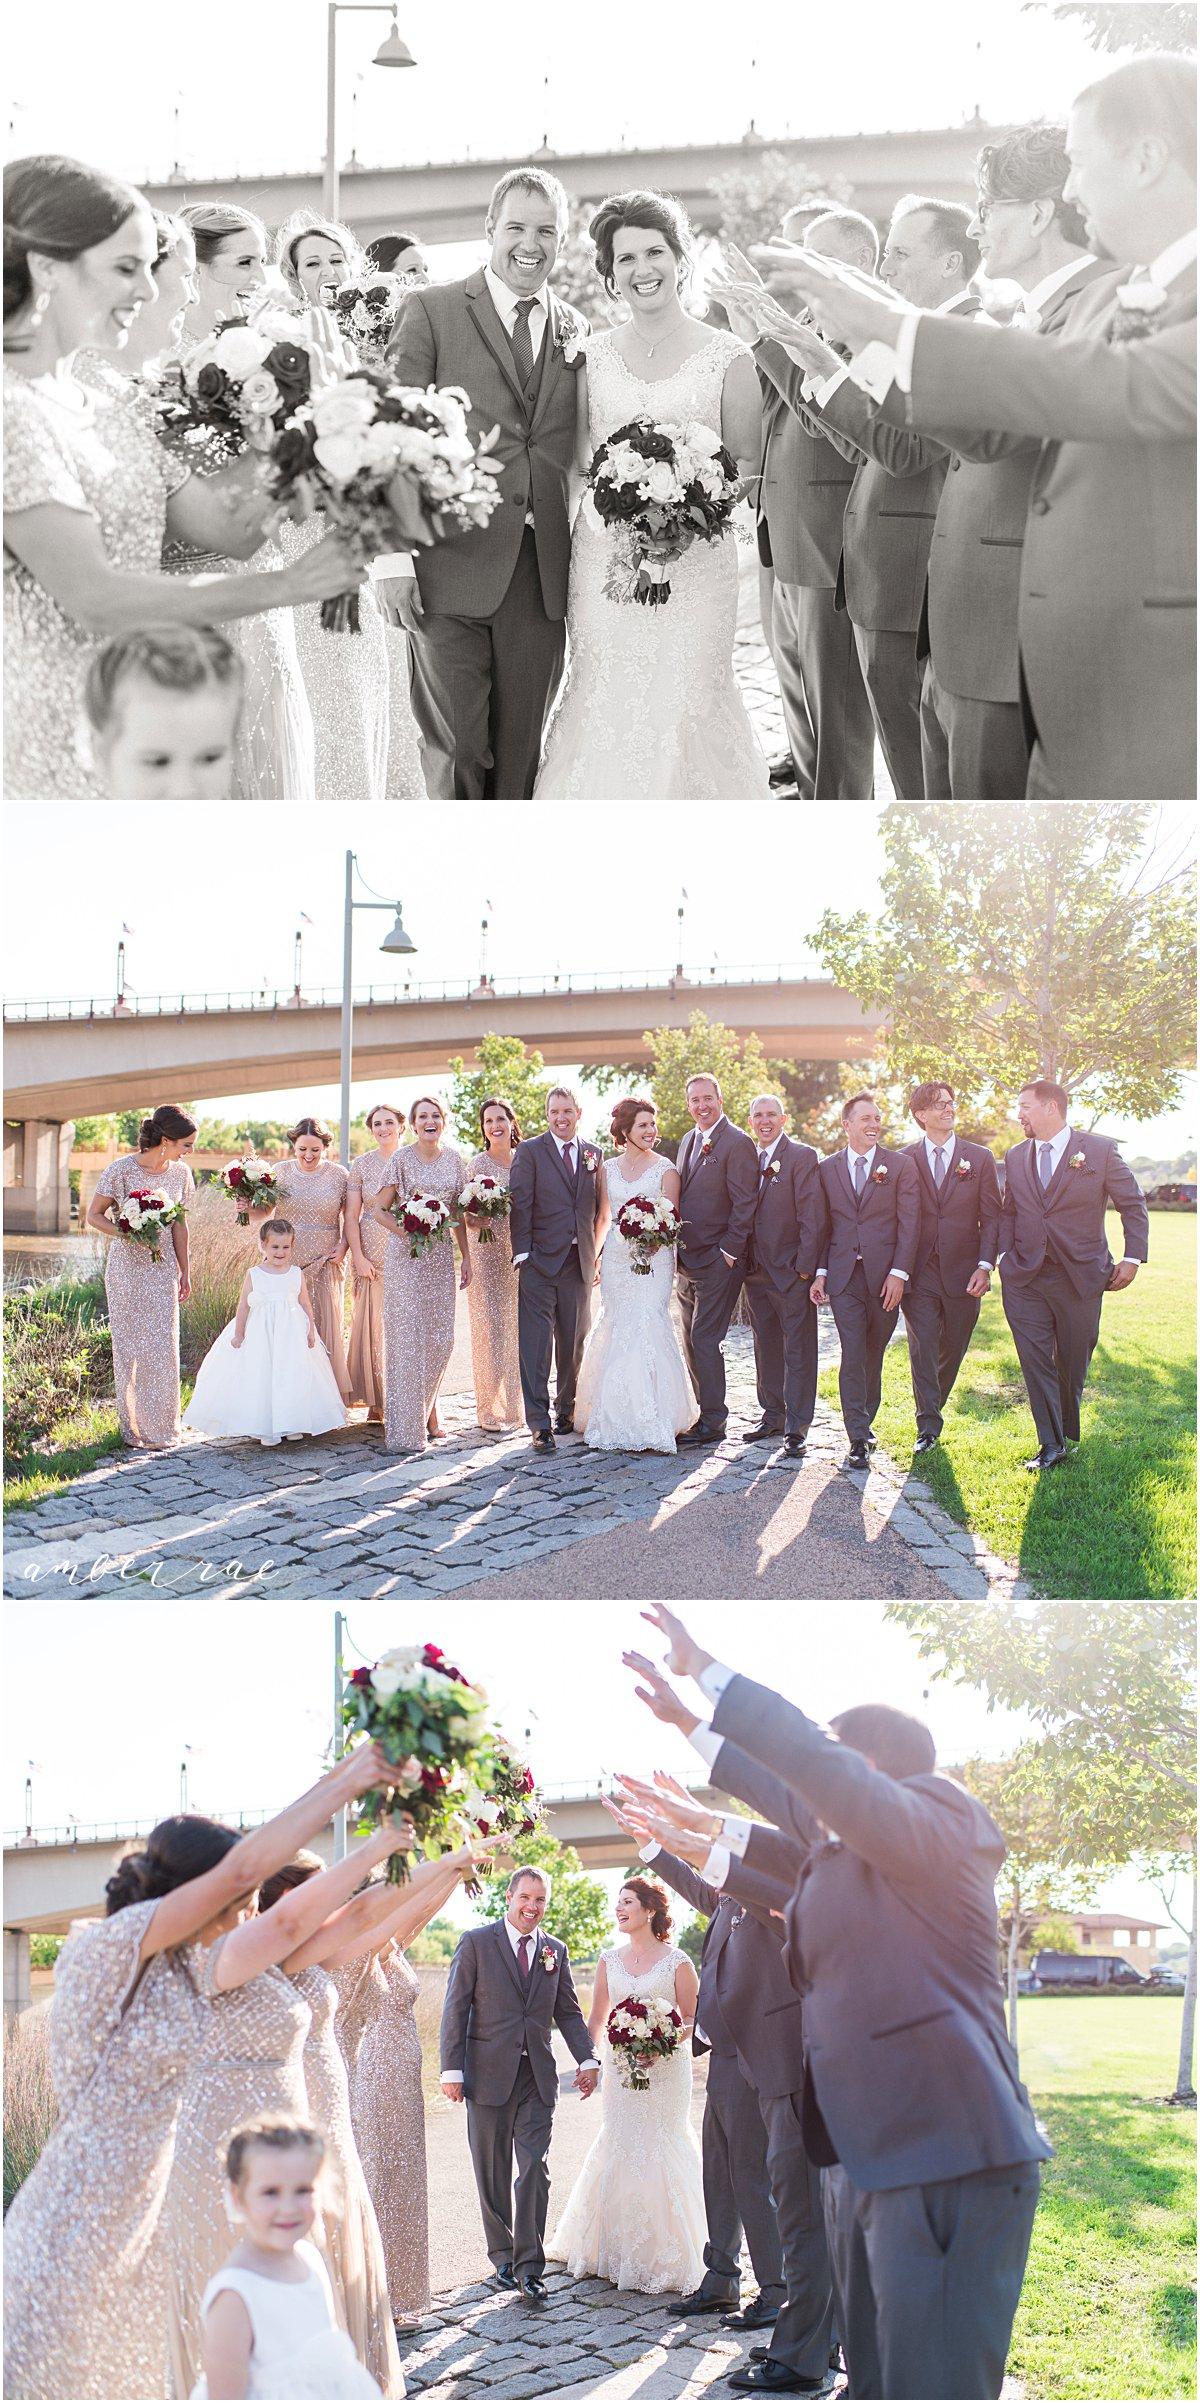 Gustafson Wedding 2018_0020.jpg